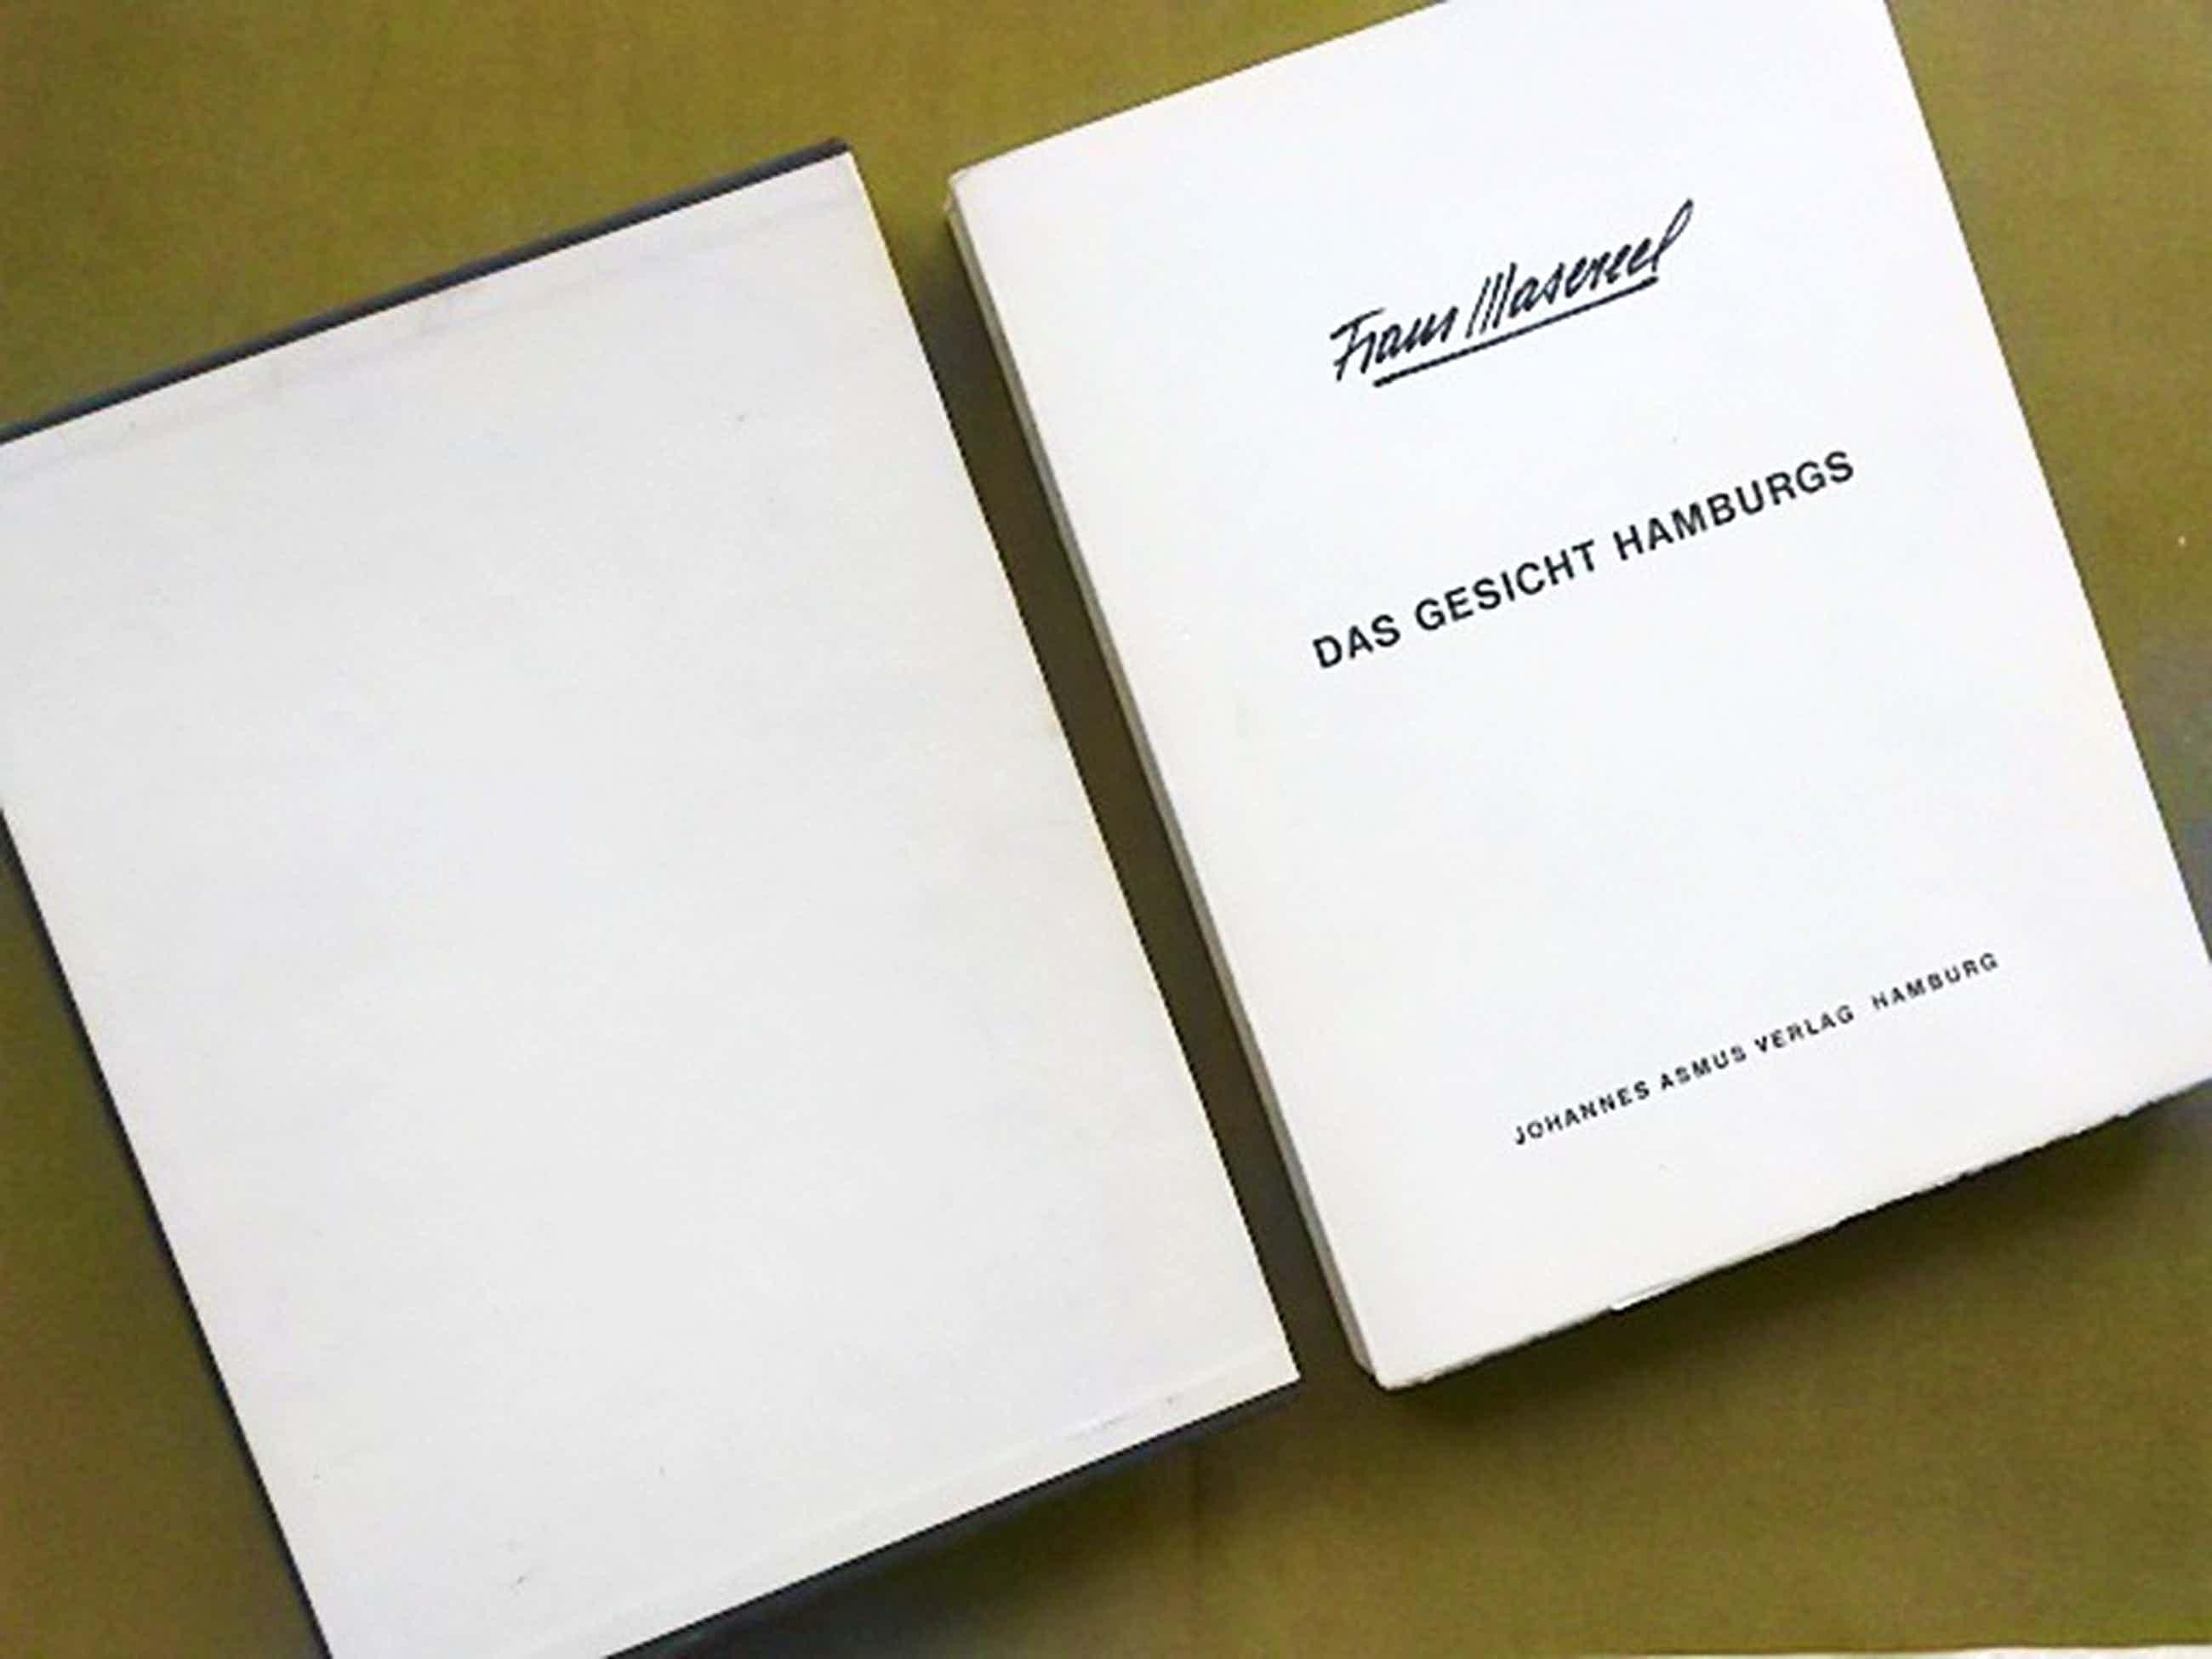 Frans Masereel, Das Gesicht Hamburgs, 1964 kopen? Bied vanaf 235!